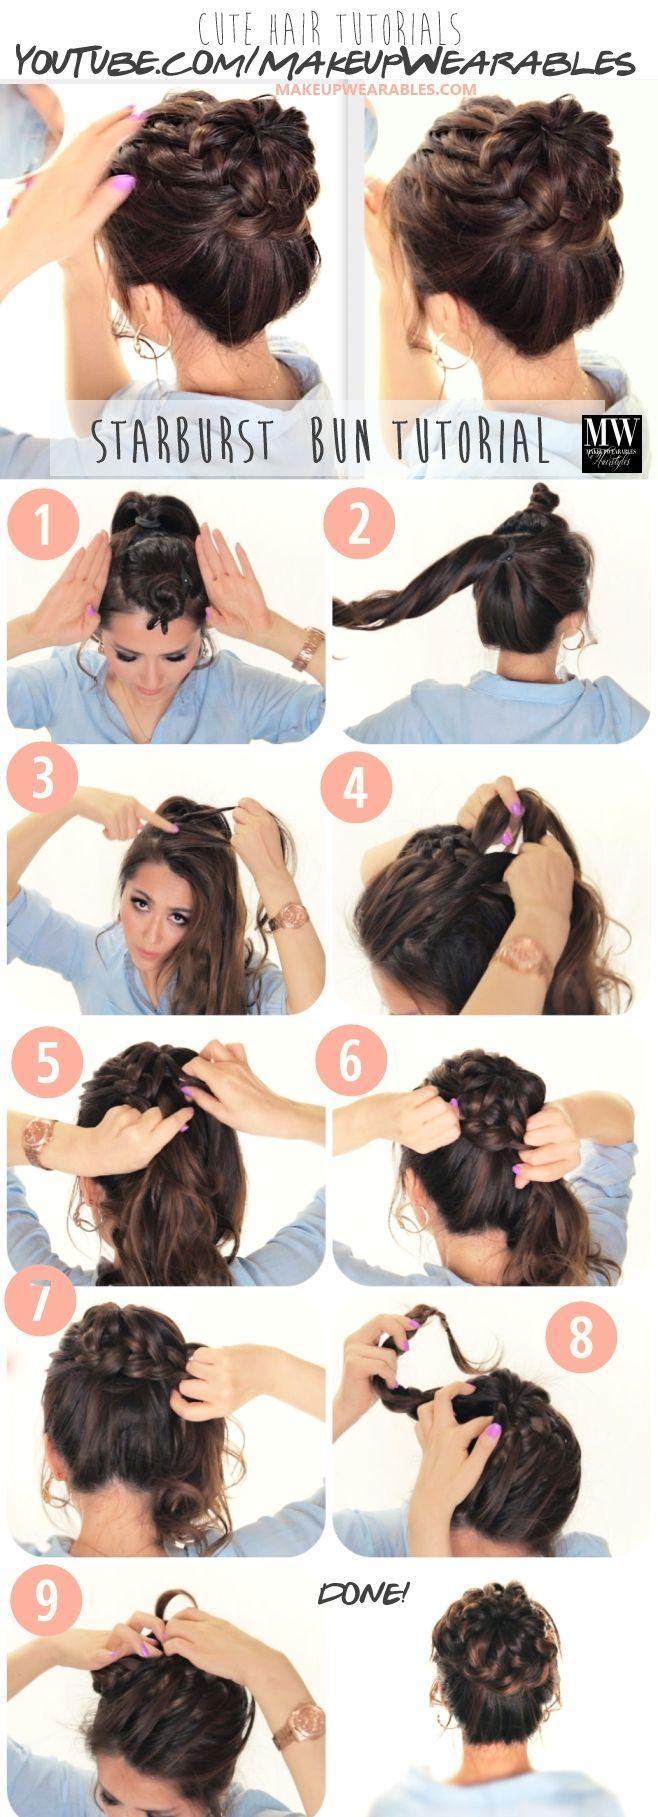 Hair tutorials how to braided messy bun hairstyles popular starburst